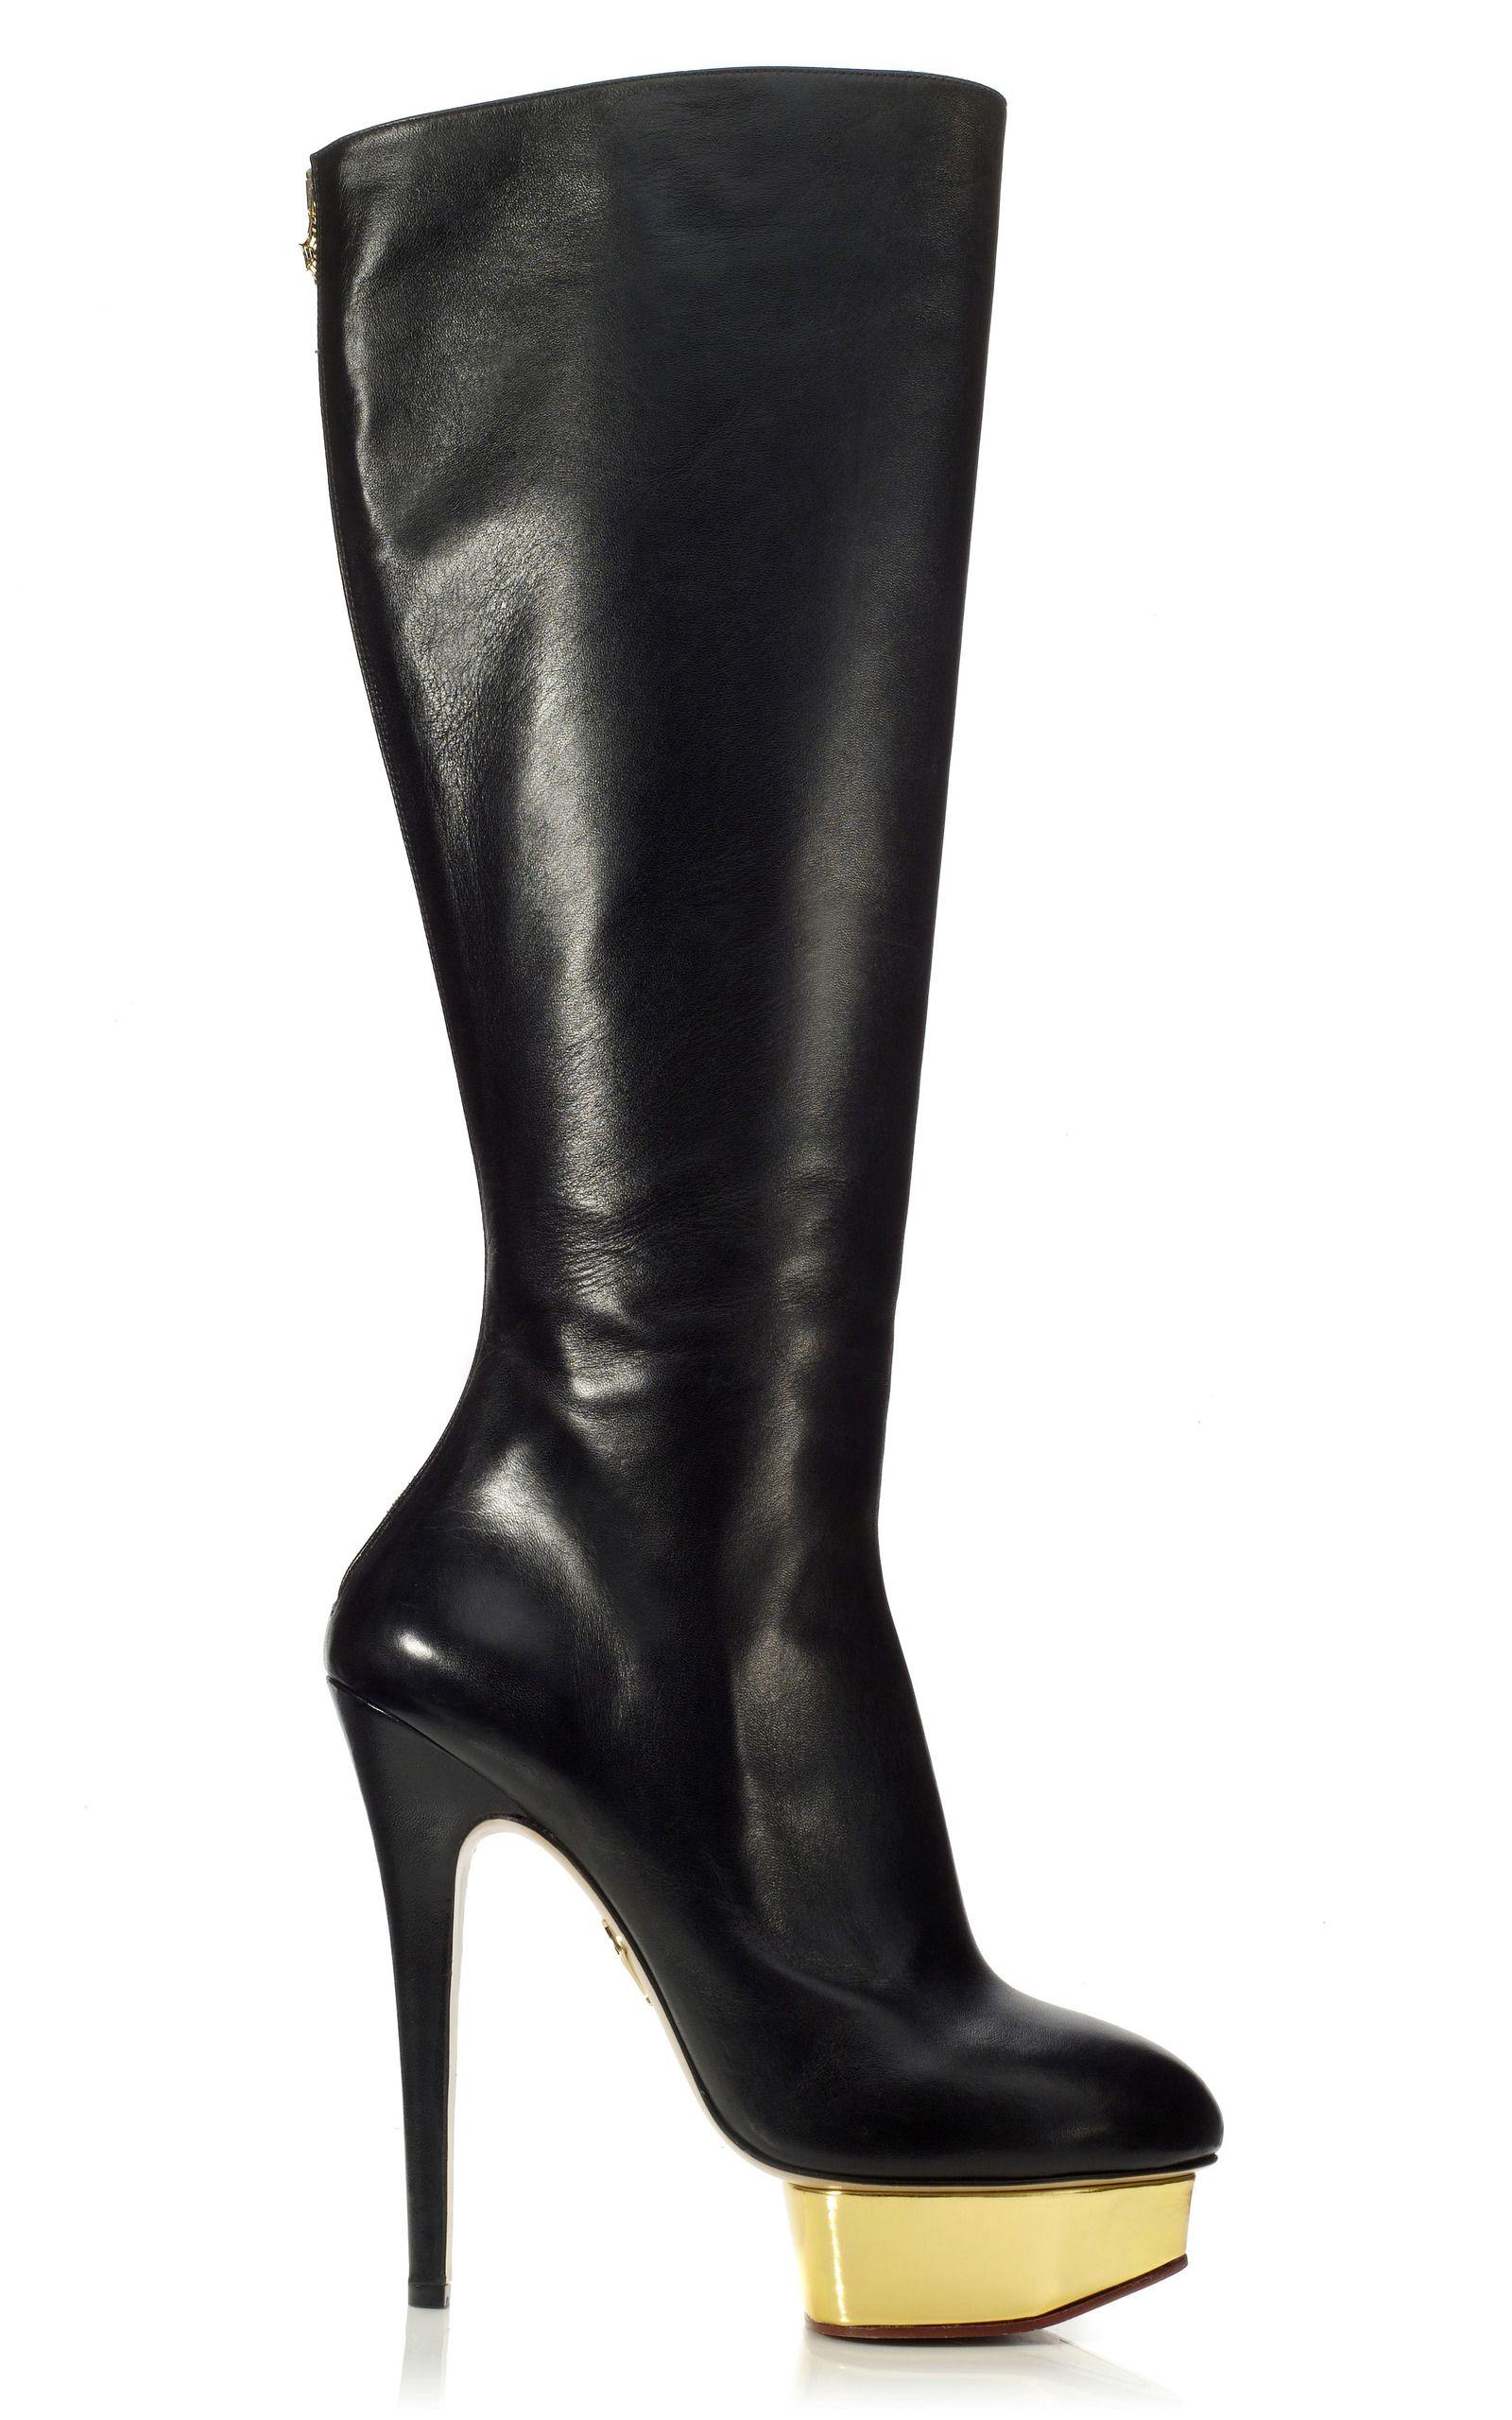 76355faa524 Bonnie Boot by Charlotte Olympia for Preorder on Moda Operandi